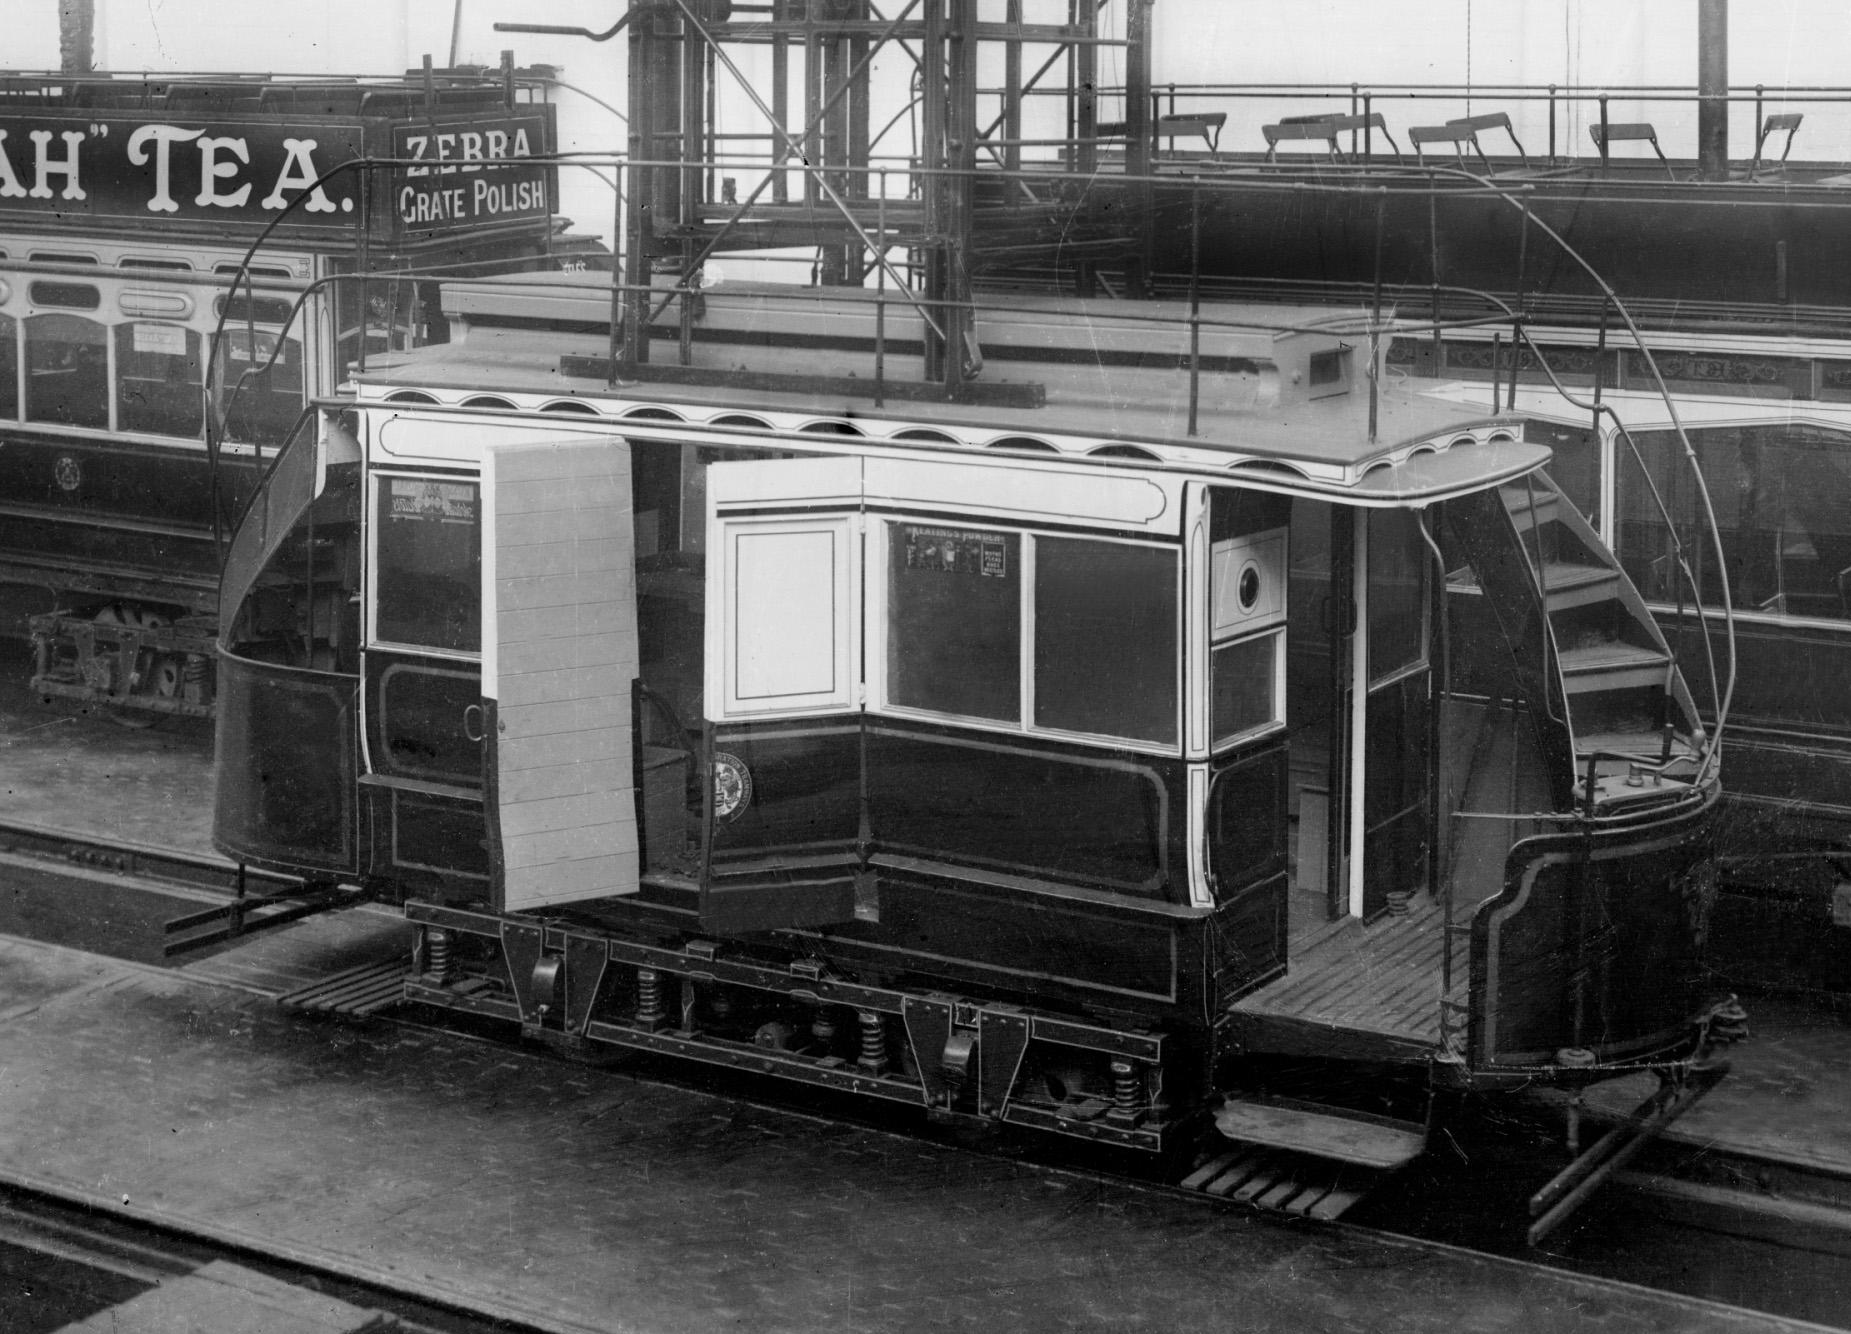 Works Car To Heritage Tram Number 4